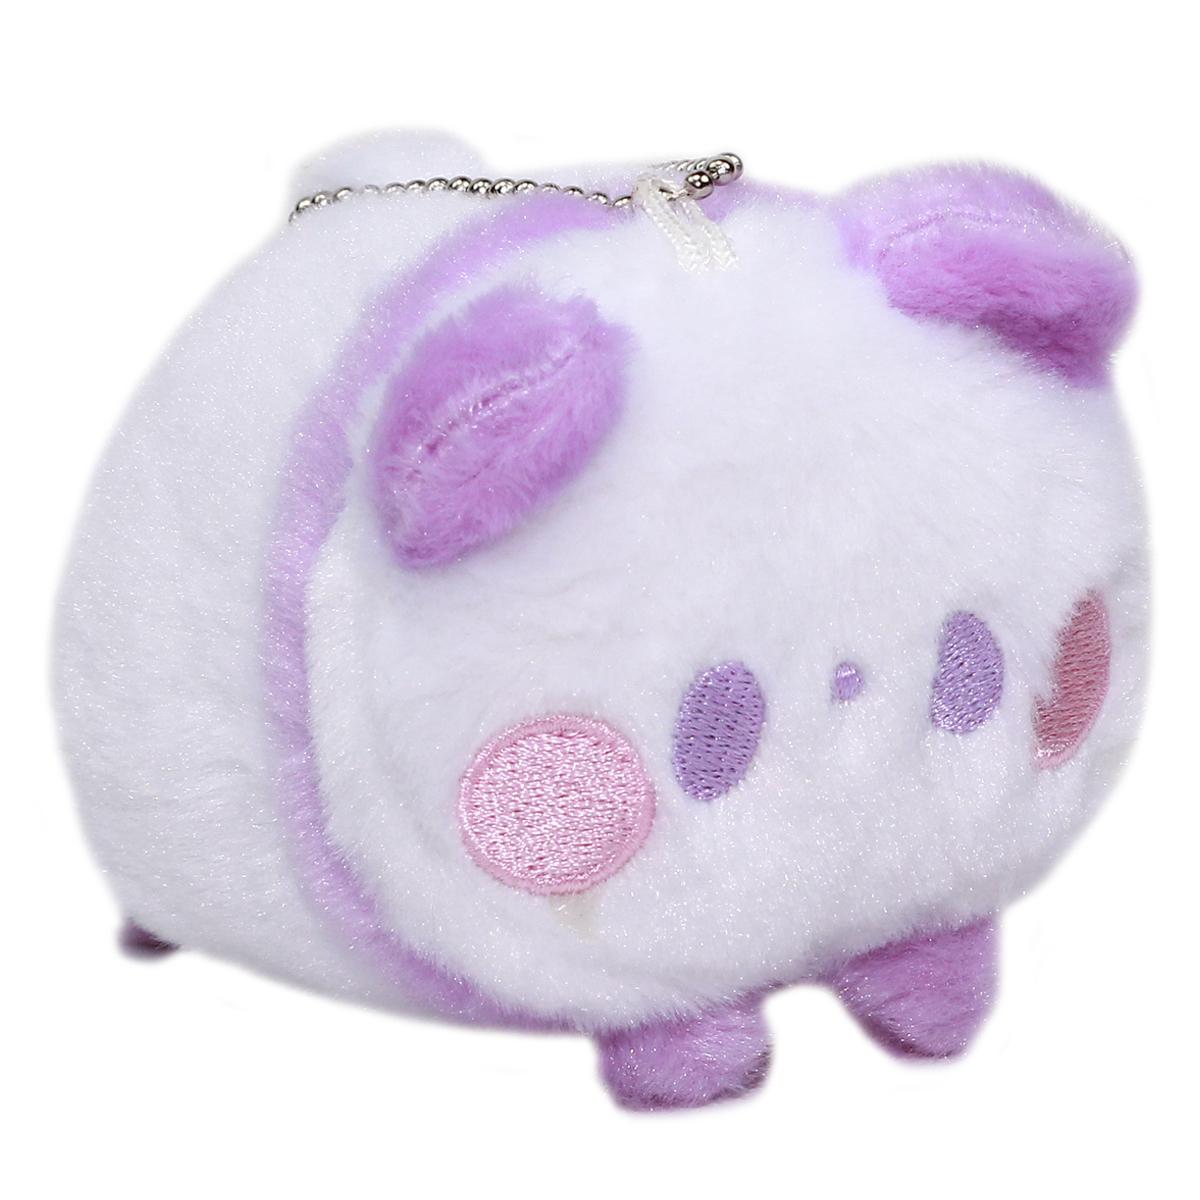 Super Soft Mochii Cute Panda Plush Keychain Purple White 3.5